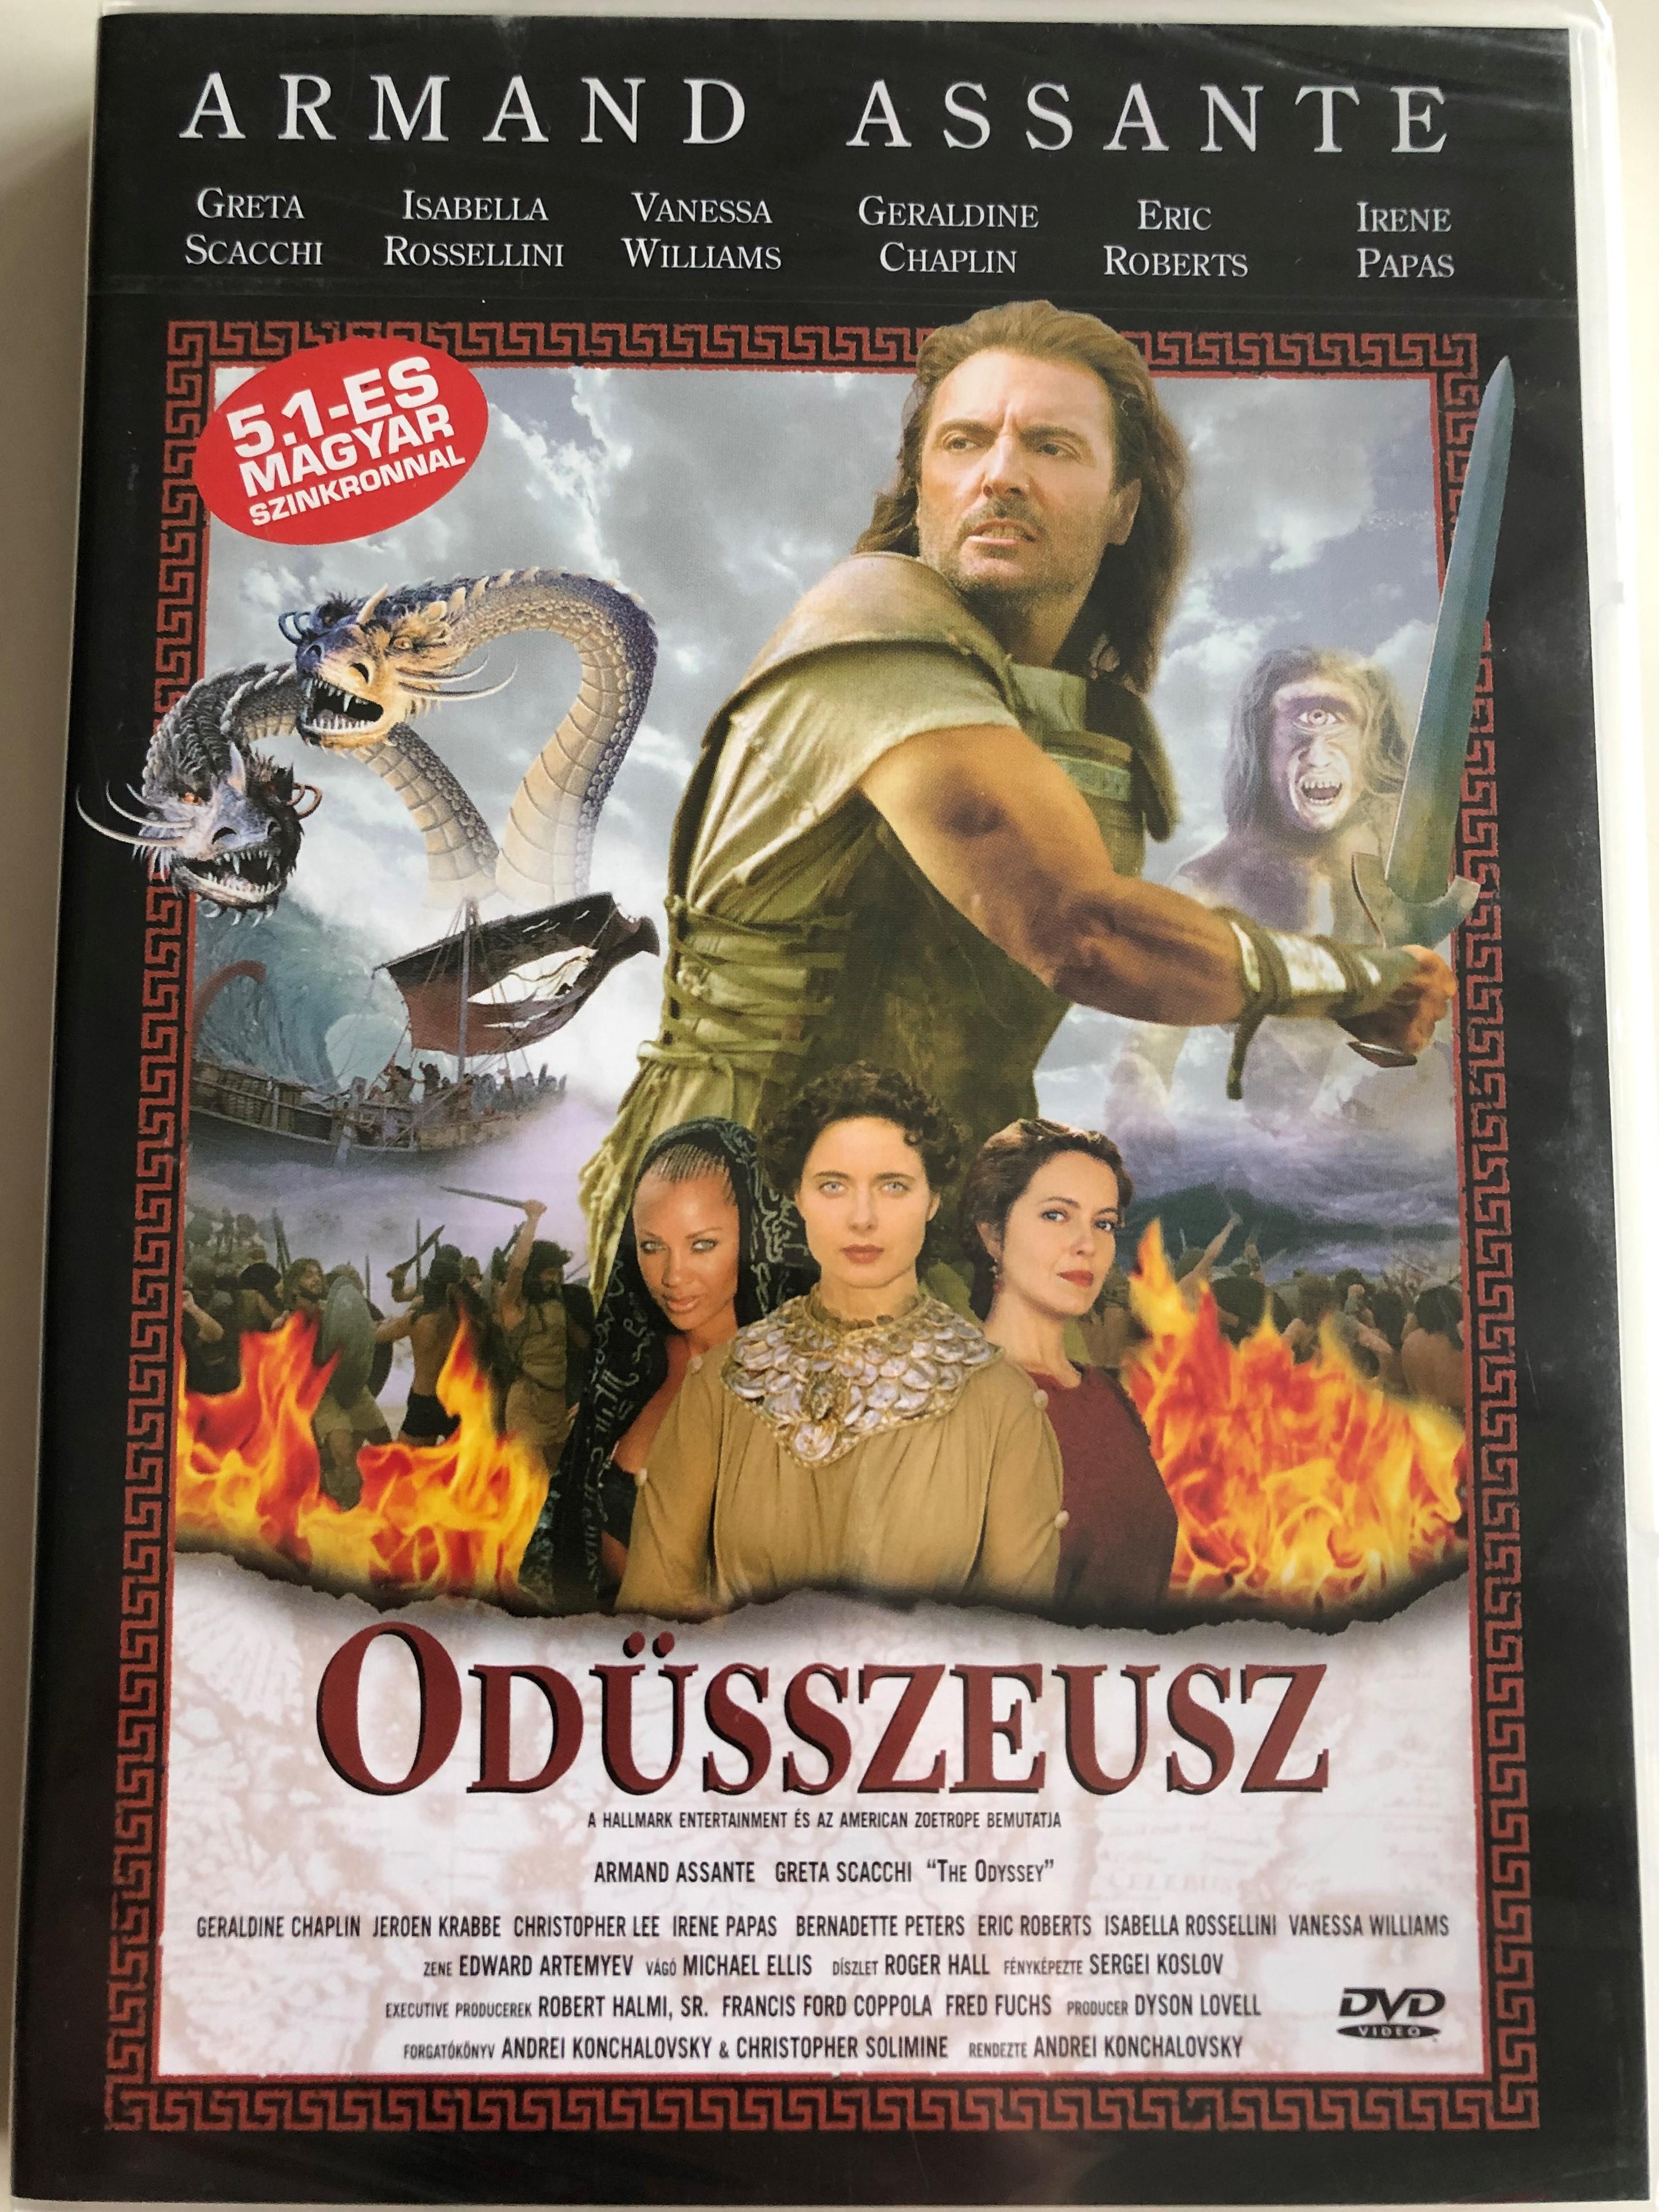 the-odyssey-dvd-1997-od-sszeusz-directed-by-andrei-konchalovsky-1.jpg